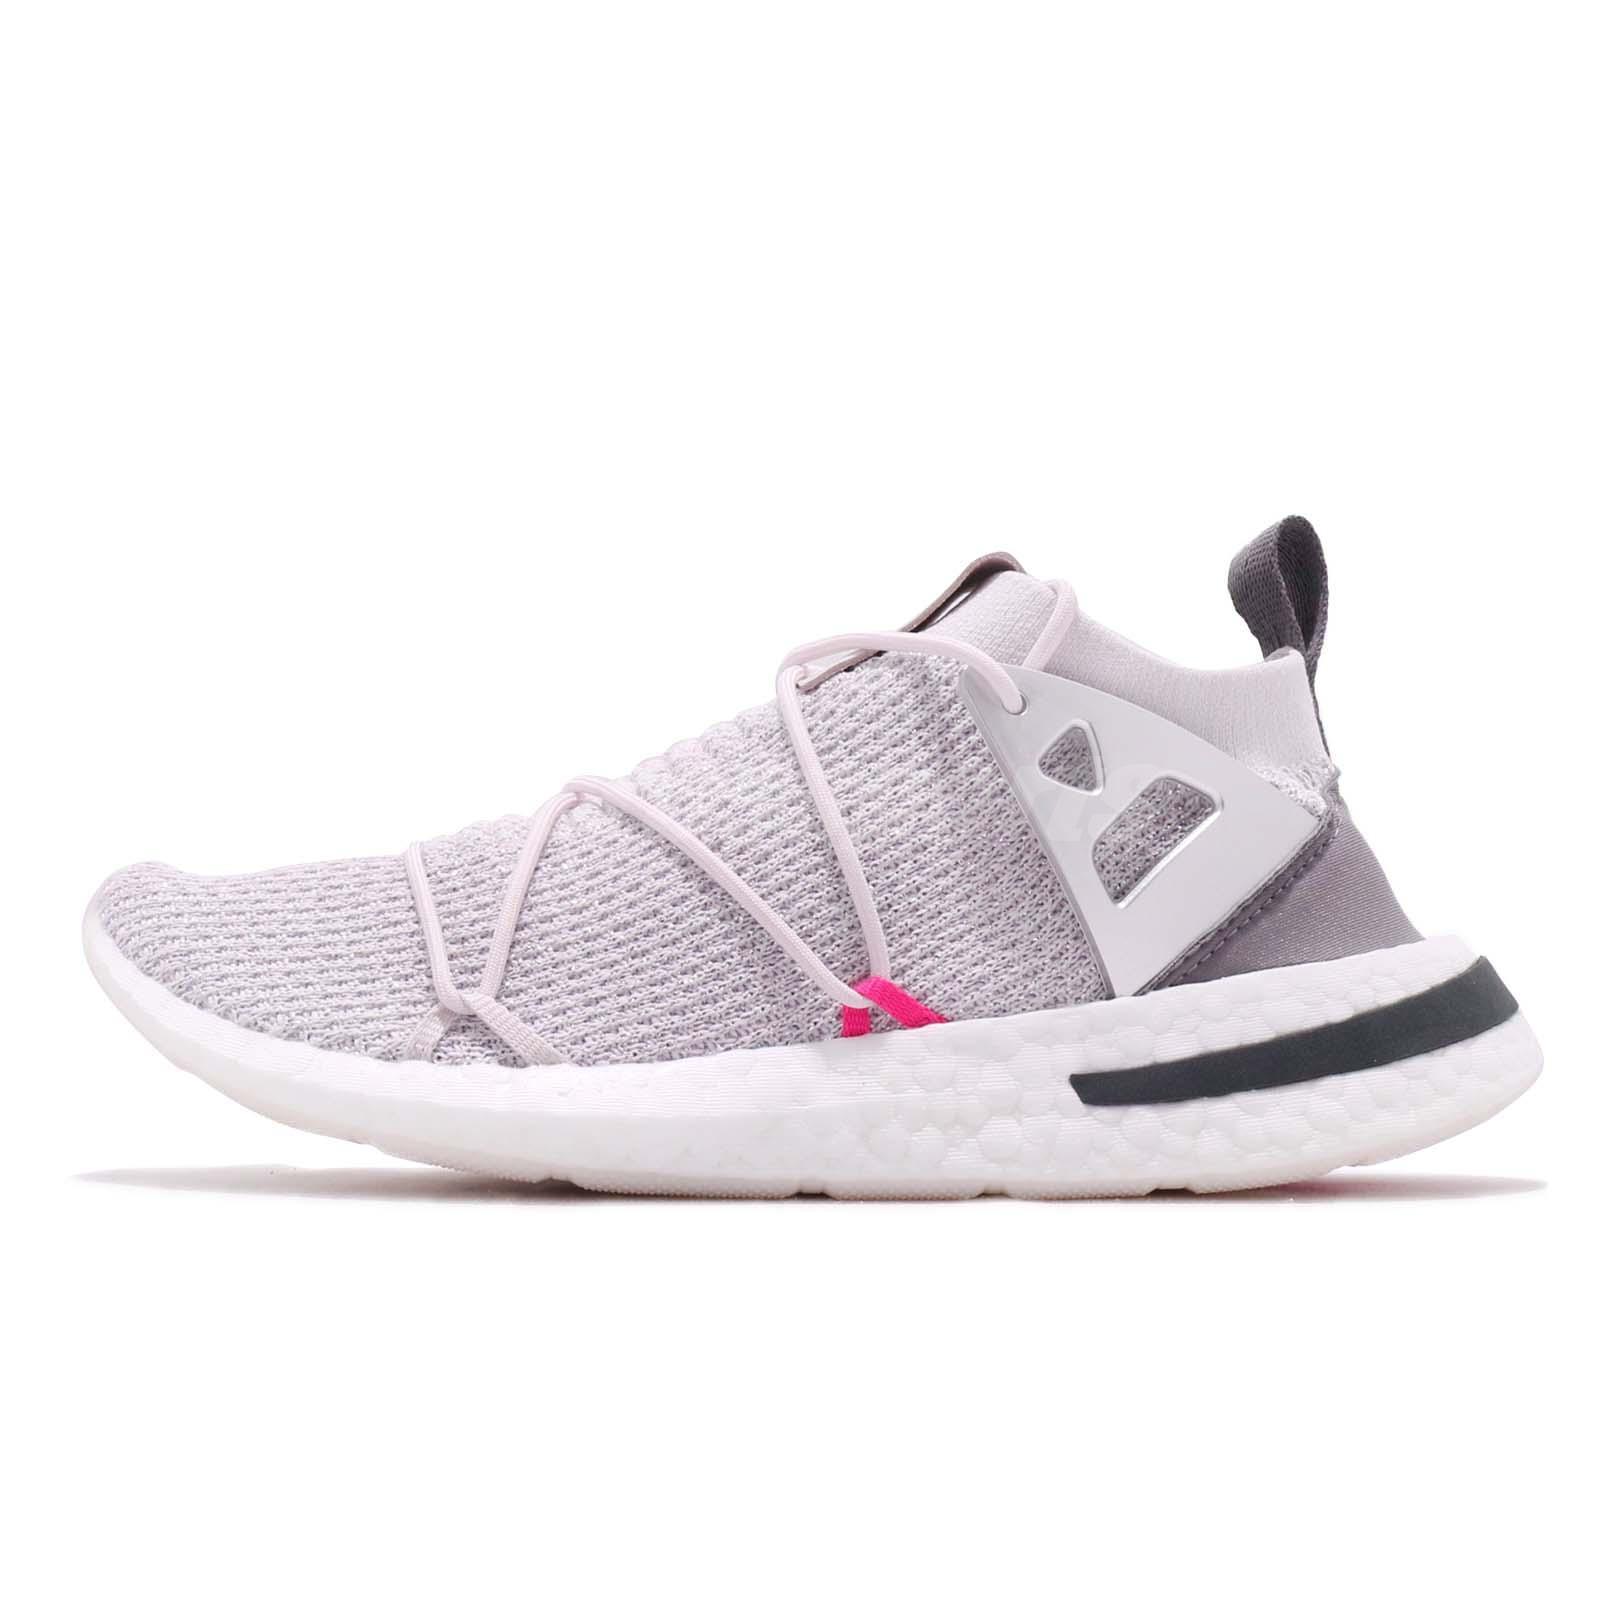 bcb45075829 adidas Originals ARKYN PK W Primeknit Boost Orchid Tint Women Shoes D96760